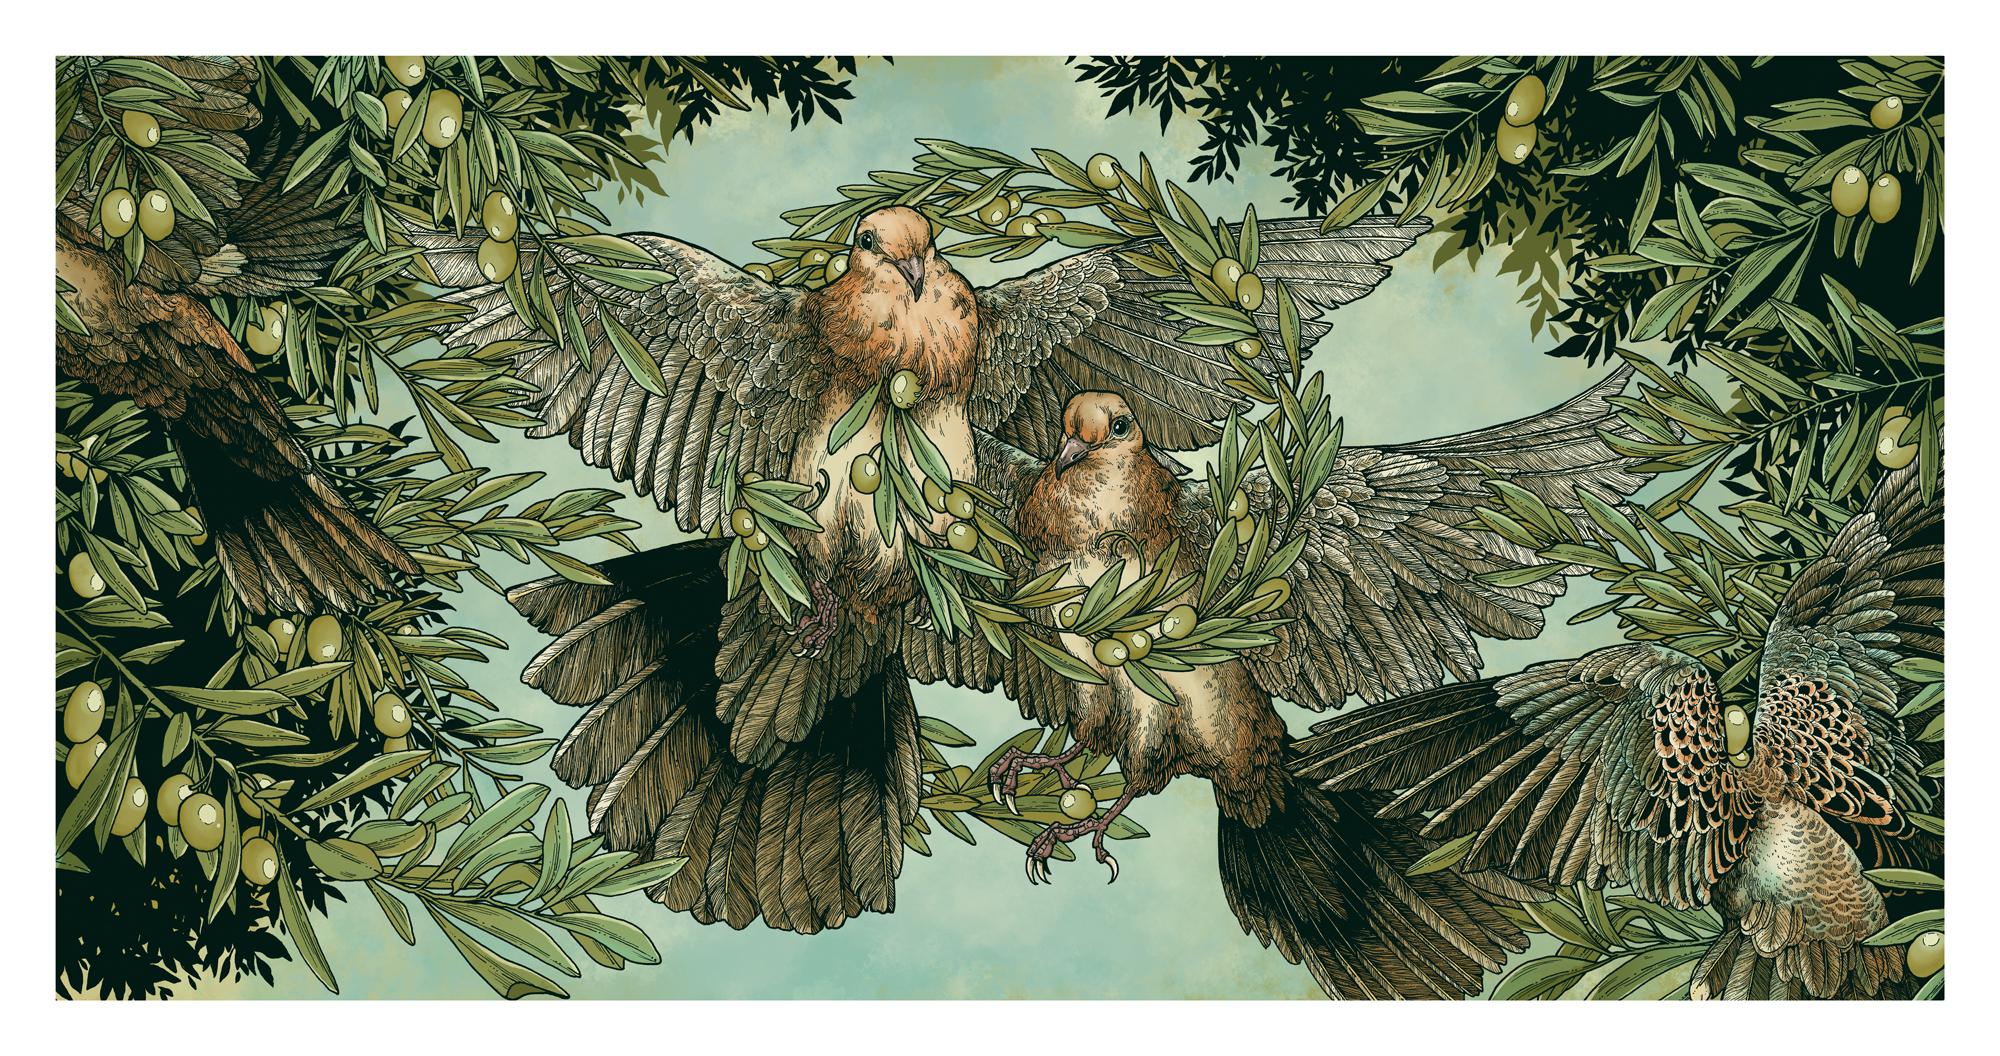 Nefesh Mountain - Beneath the Open Sky - Album Art - Inside Spread - Erica Williams - Art Print - Saturnalia.jpg